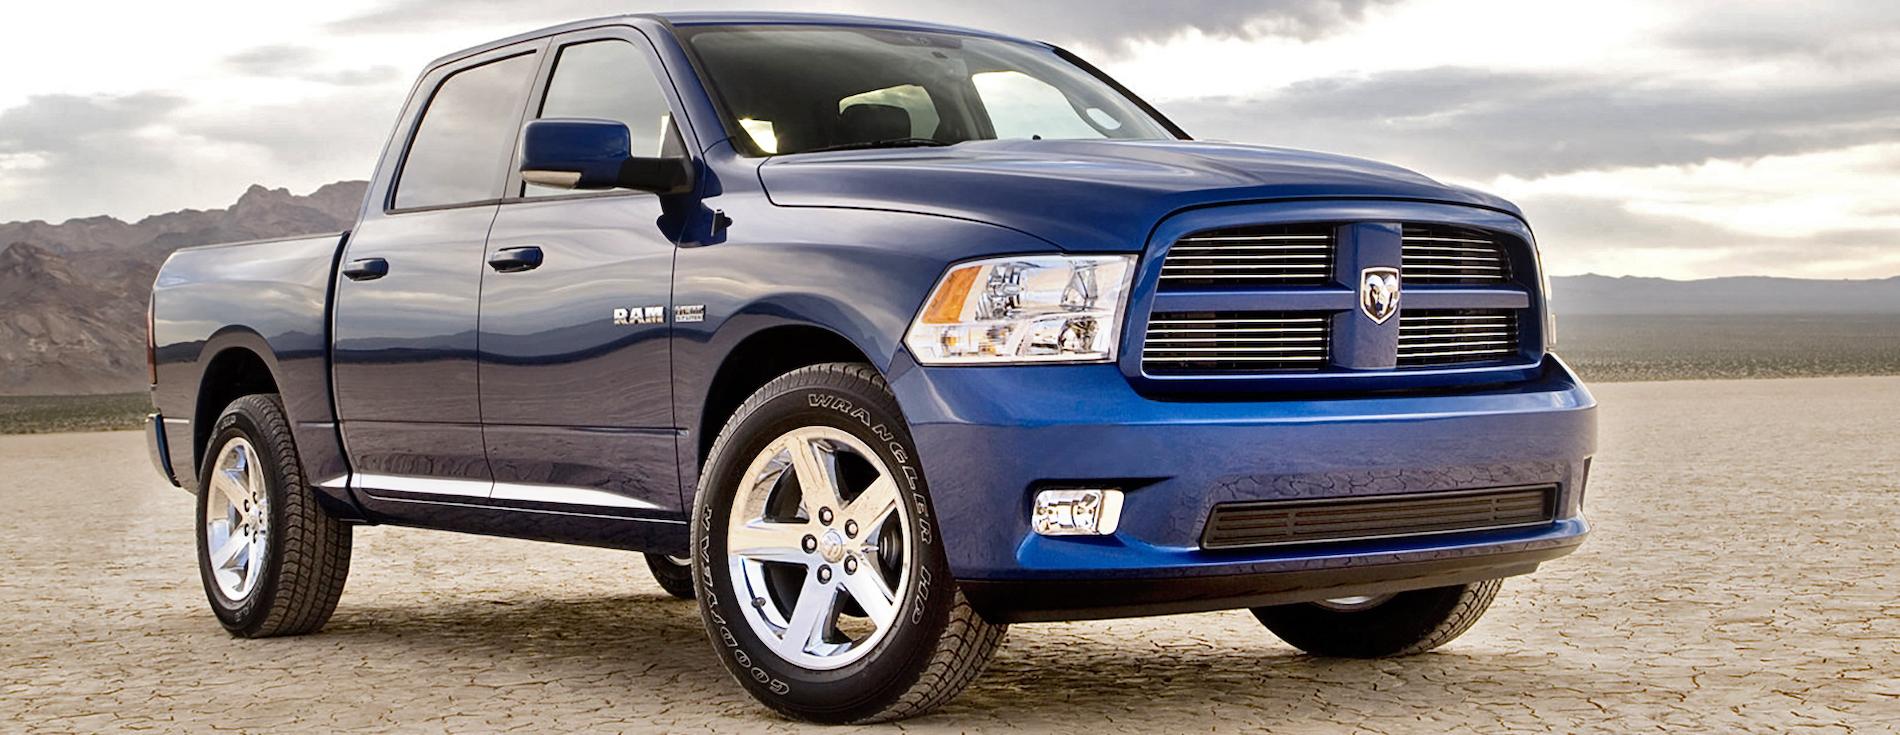 Dodge-Ram_1500_Sport-2009-1600-01